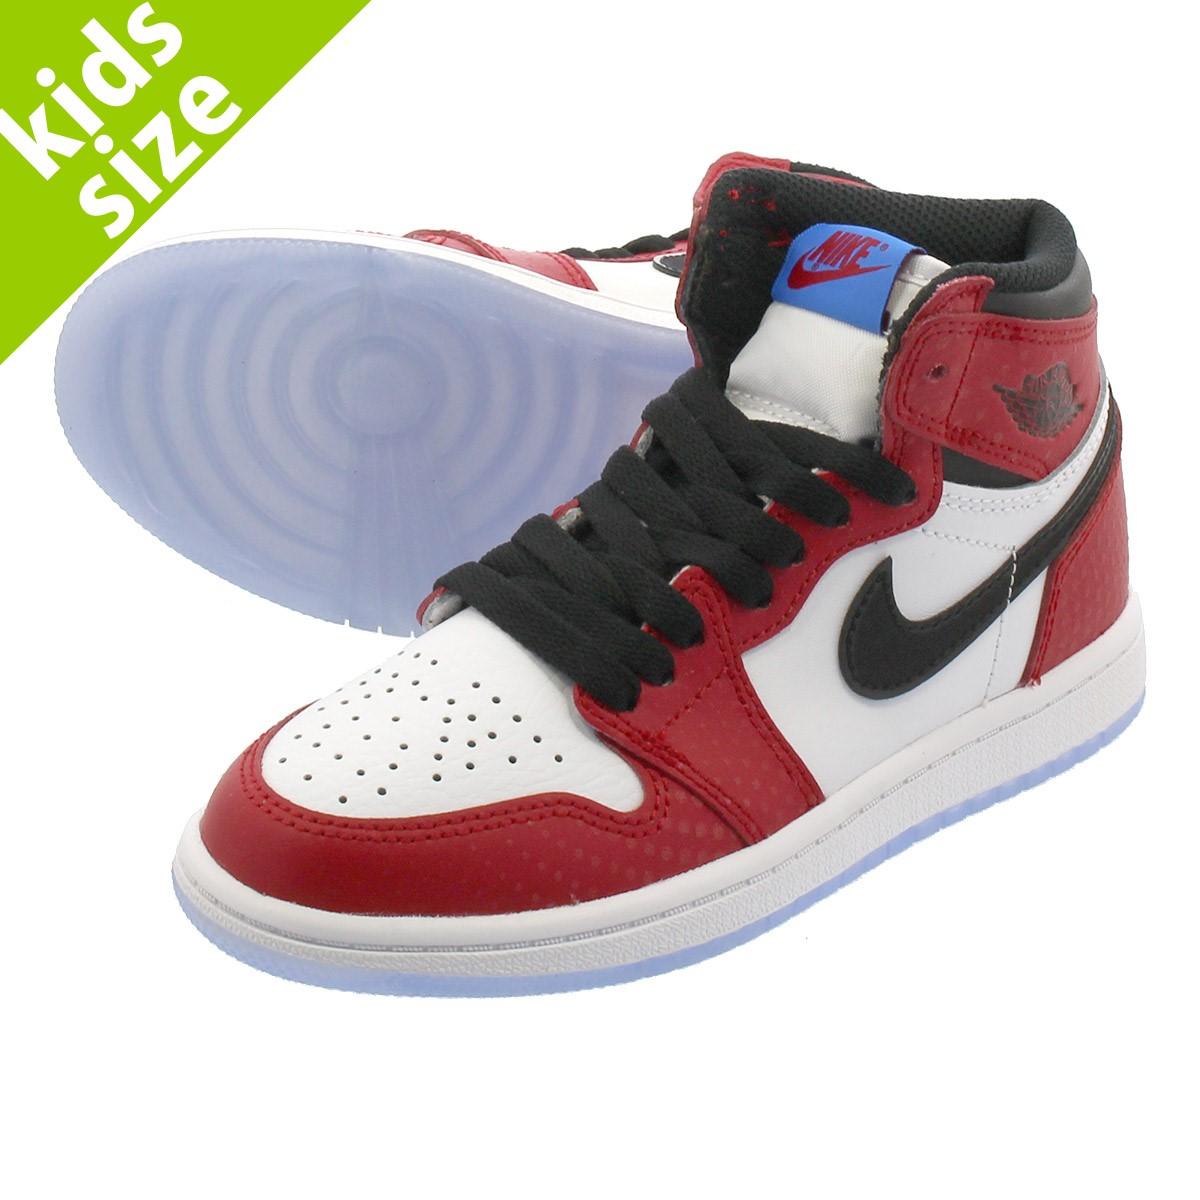 new product 7dfaf 8f18b NIKE AIR JORDAN 1 RETRO HIGH OG BP Nike Air Jordan 1 nostalgic high OG BP  GYM RED/WHITE/PHOTO BLUE/BLACK